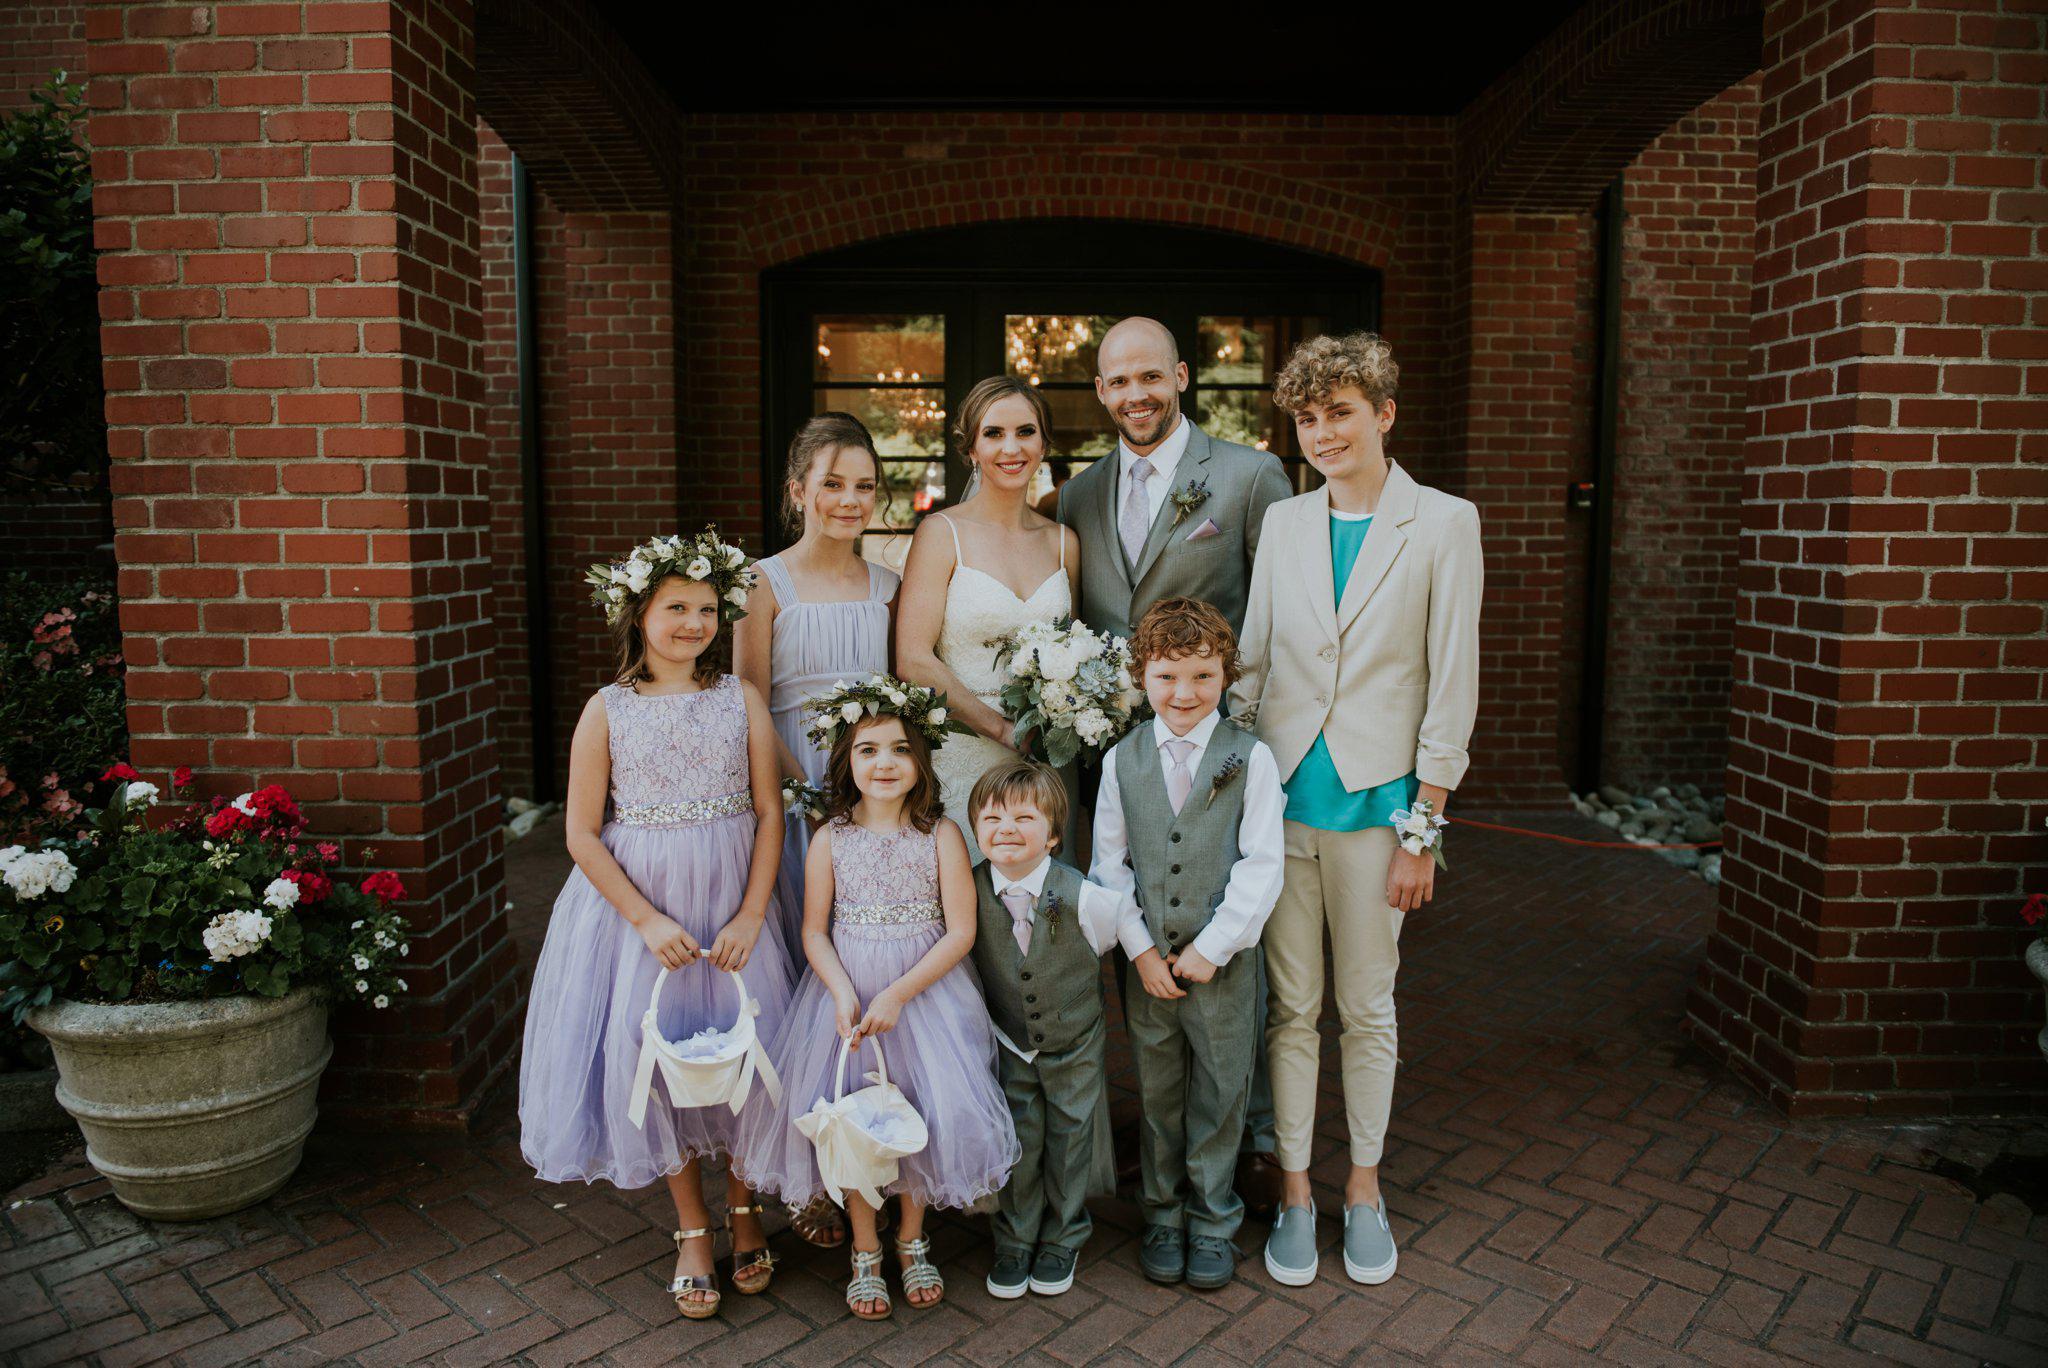 hollywood-school-house-wedding-seattle-photographer-caitlyn-nikula-54.jpg